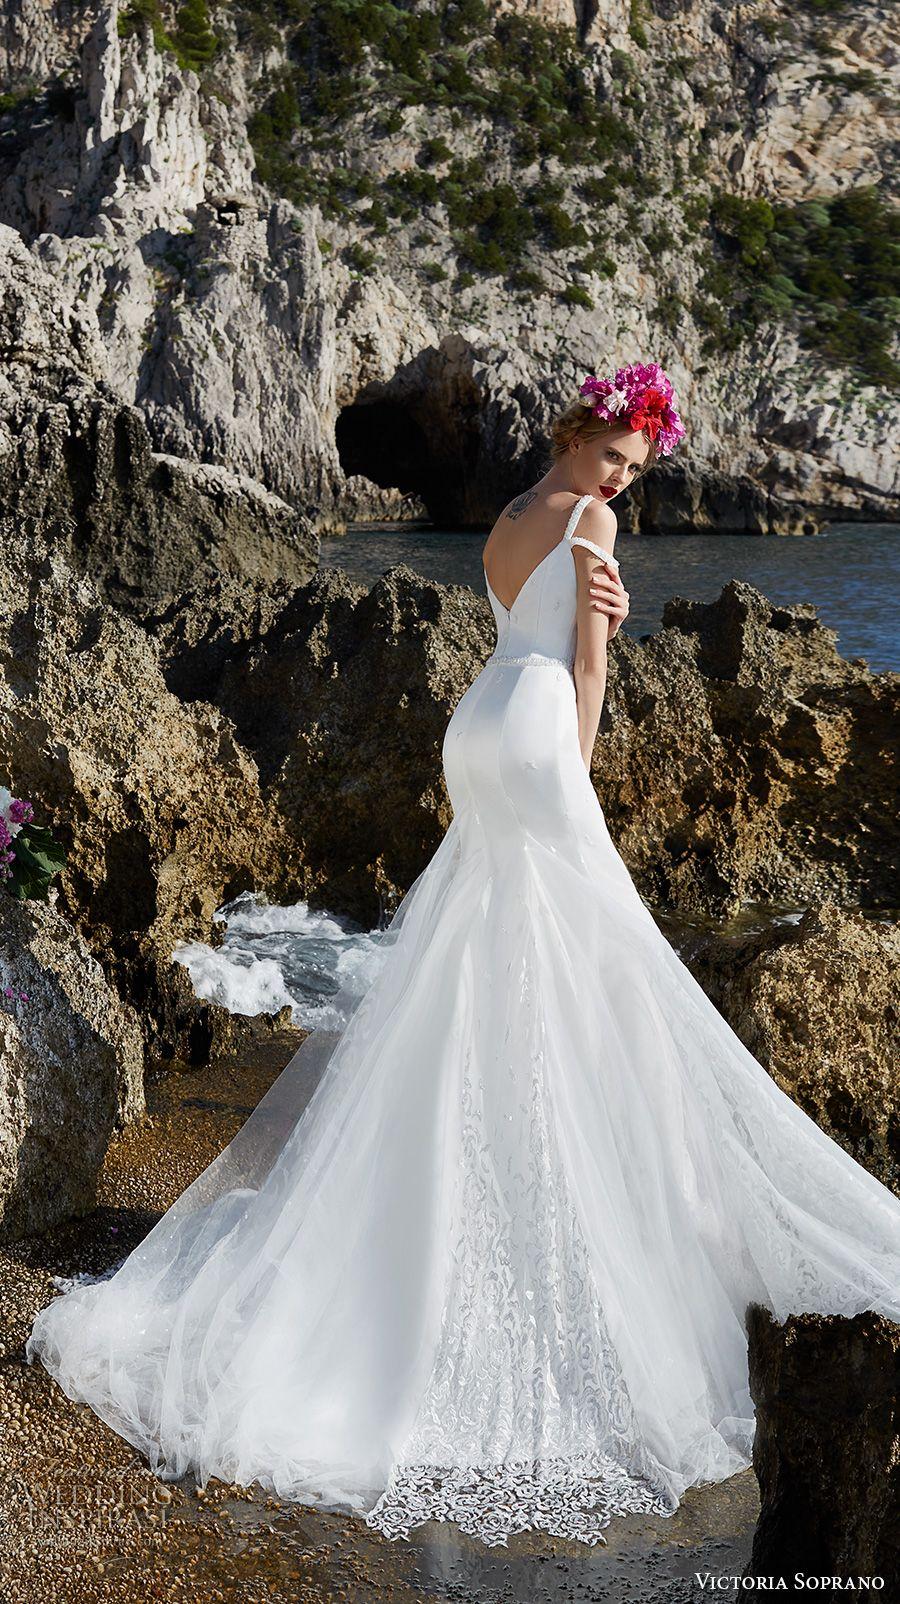 victoria soprano 2017 bridal double thin strap deep sweetheart neckline heavily embellished bodice elegant fit and flare wedding dress open v back chapel back (7) bv -- Victoria Soprano 2017 Wedding Dresses